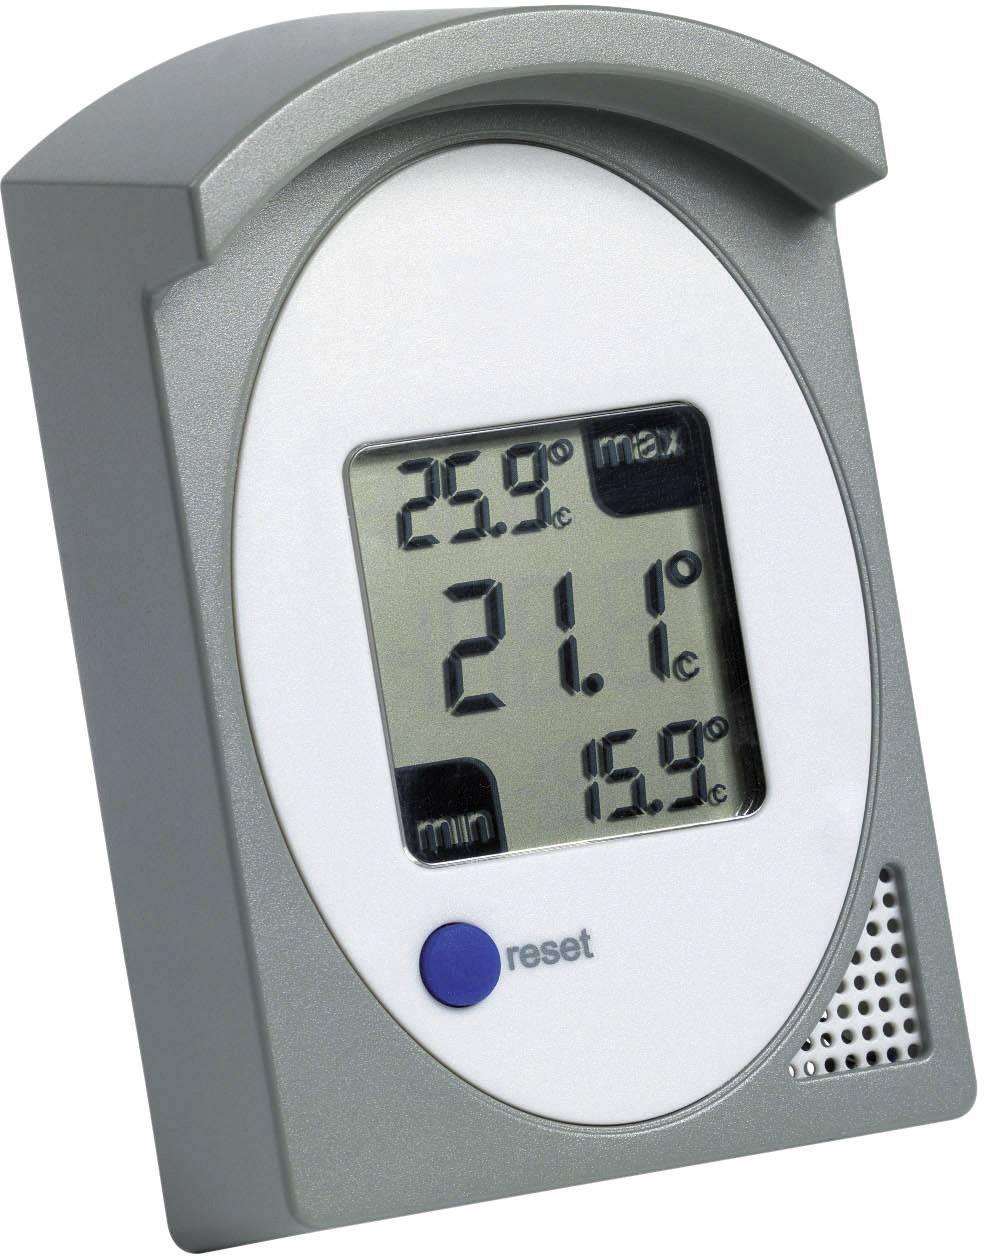 TFA 30.1017.10 Termometro Grig